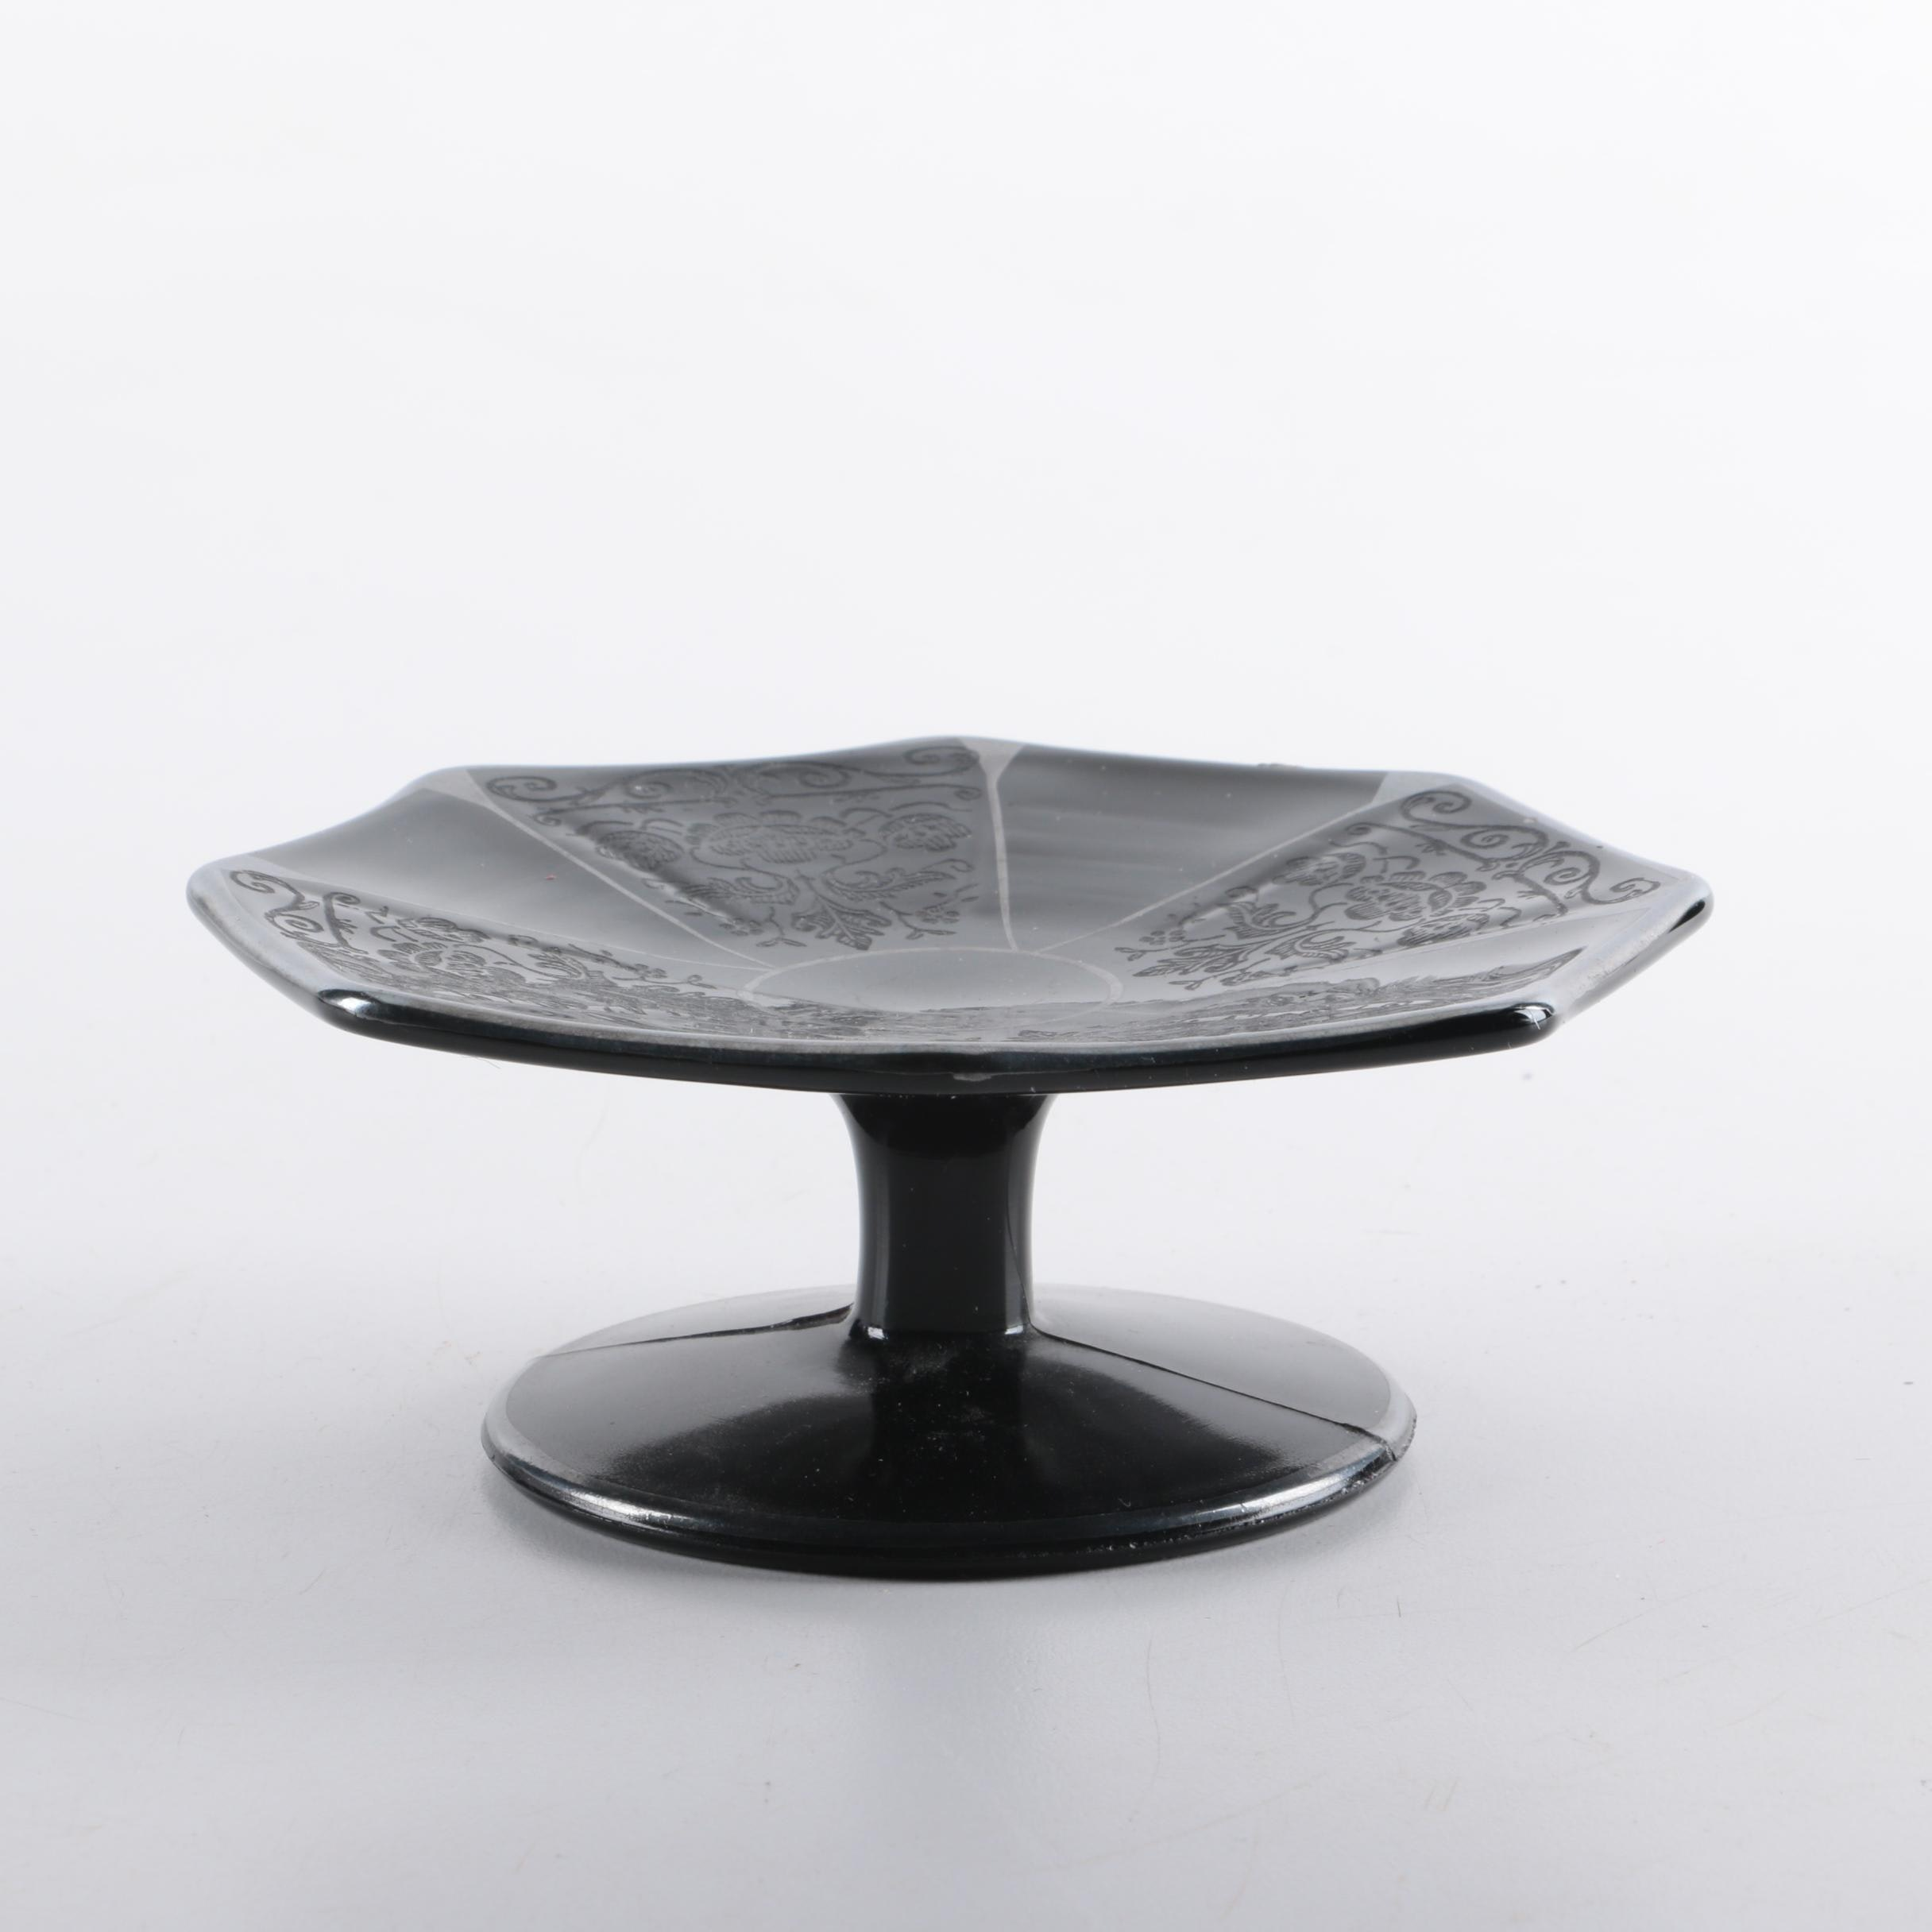 Black Amethyst Depression Glass Cake Plate ... & Black Amethyst Depression Glass Cake Plate : EBTH